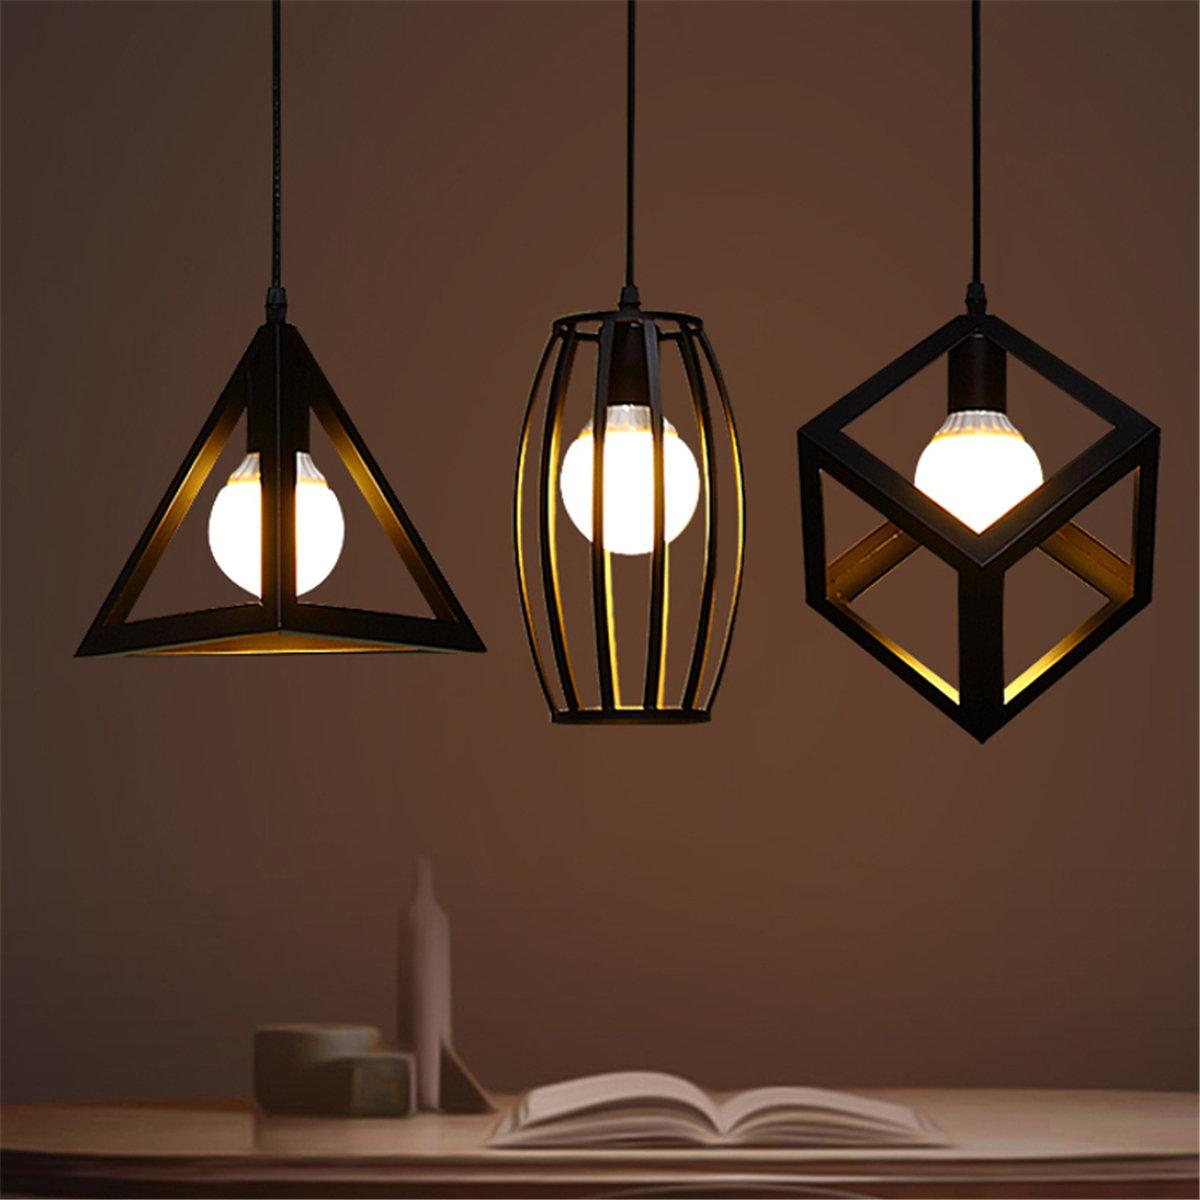 Image of: E27 Industrial Ceiling Light Vintage Chandelier Pendant Kitchen Bar Fixture Lamp Is Retro Newchic